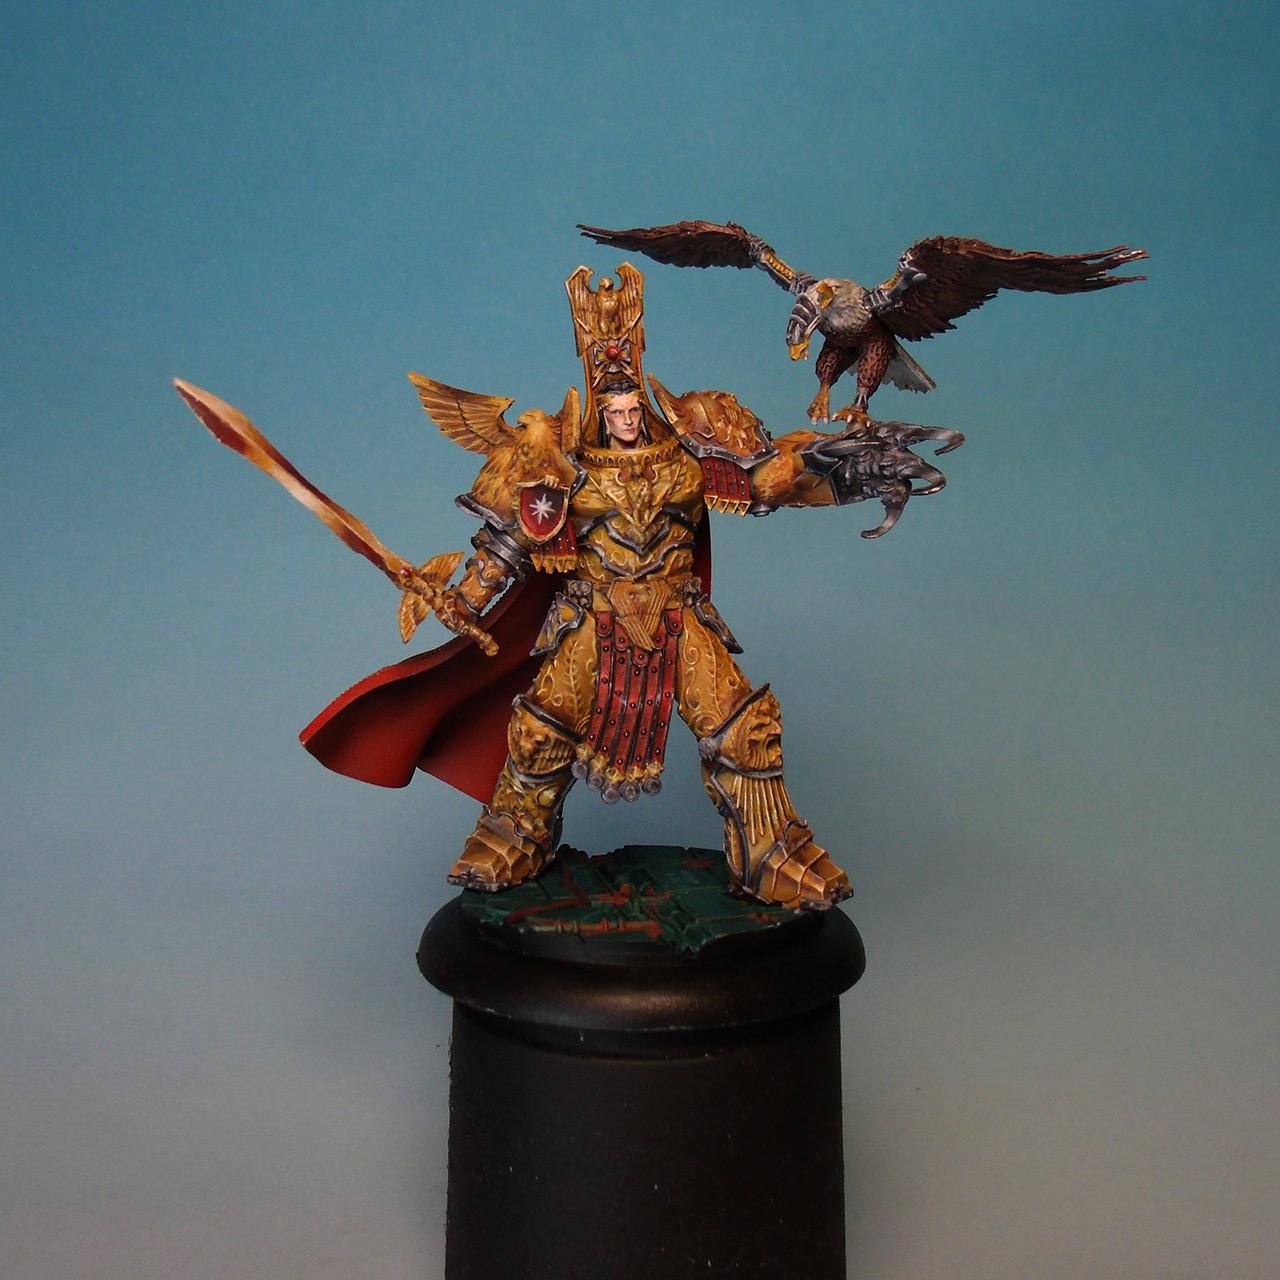 Miscellaneous: Celestial knight, photo #1